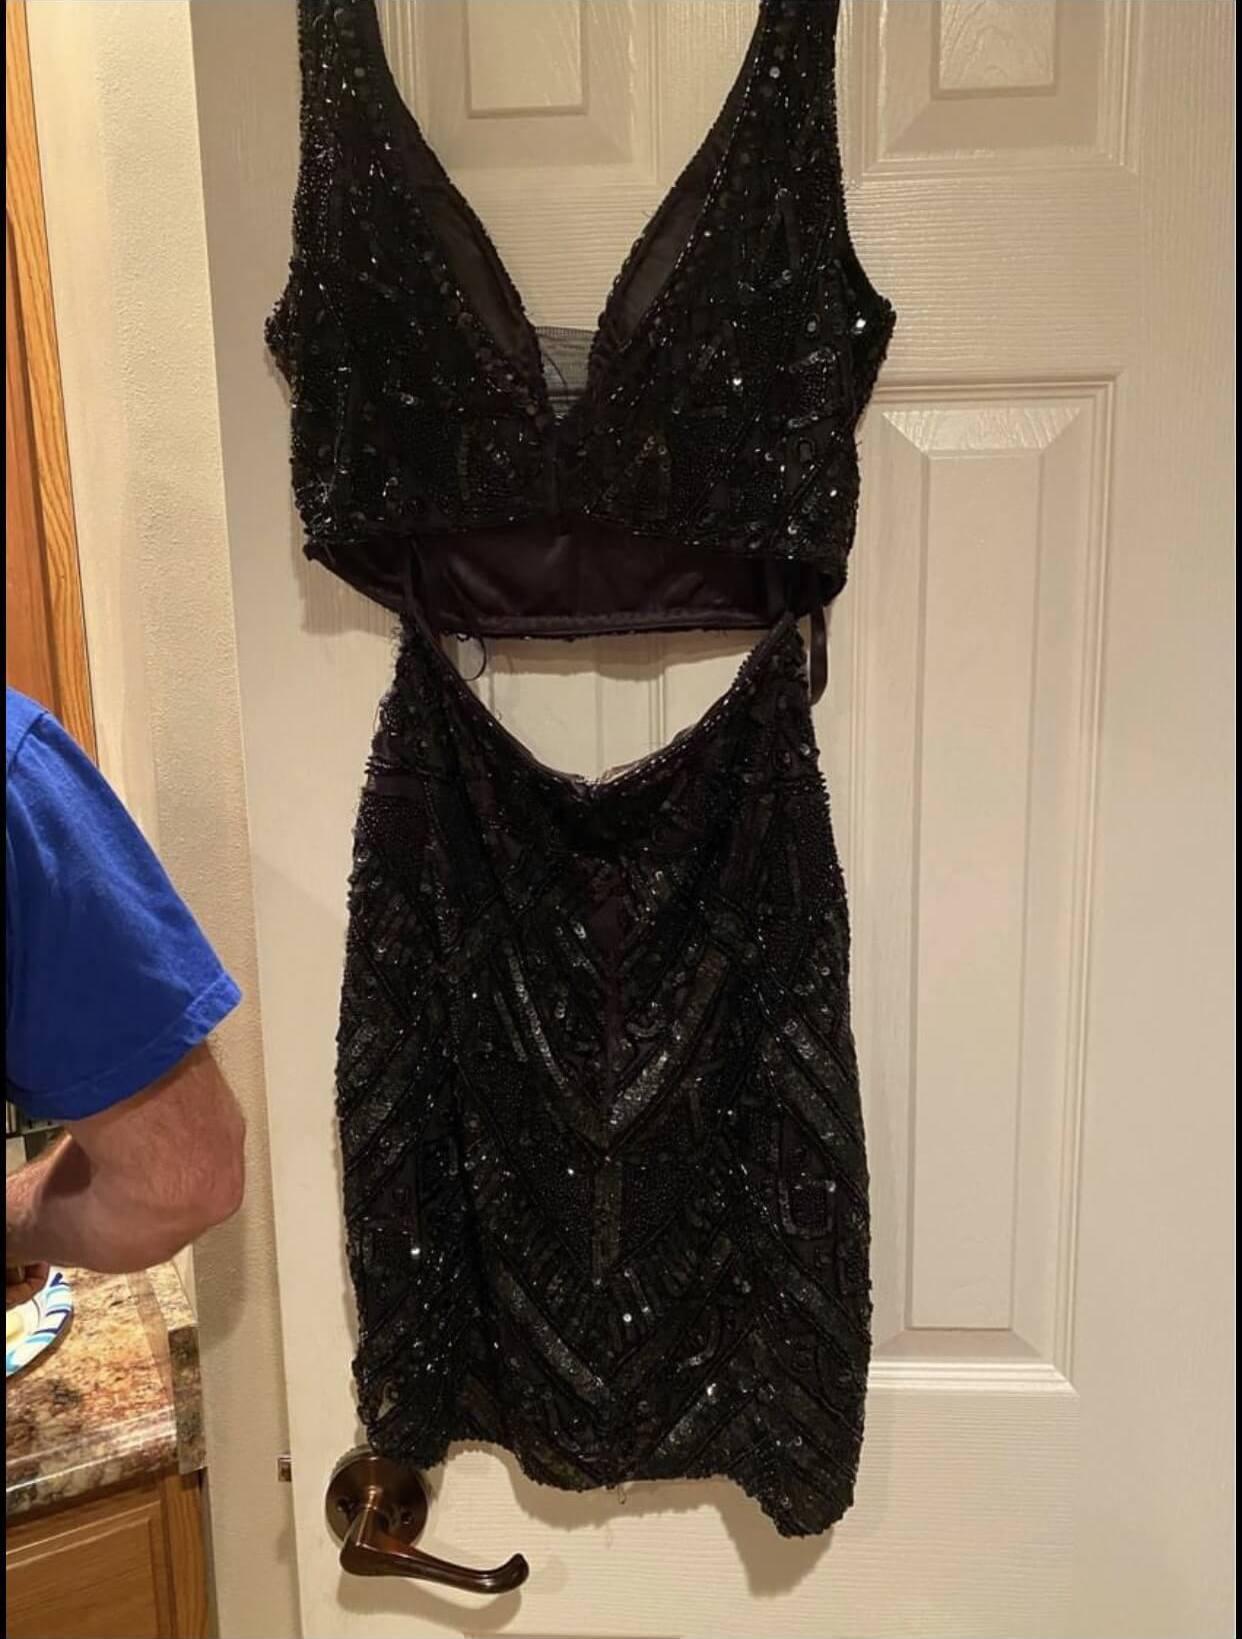 Primavera Black Size 8 Nightclub Sorority Formal Tall Height Cocktail Dress on Queenly